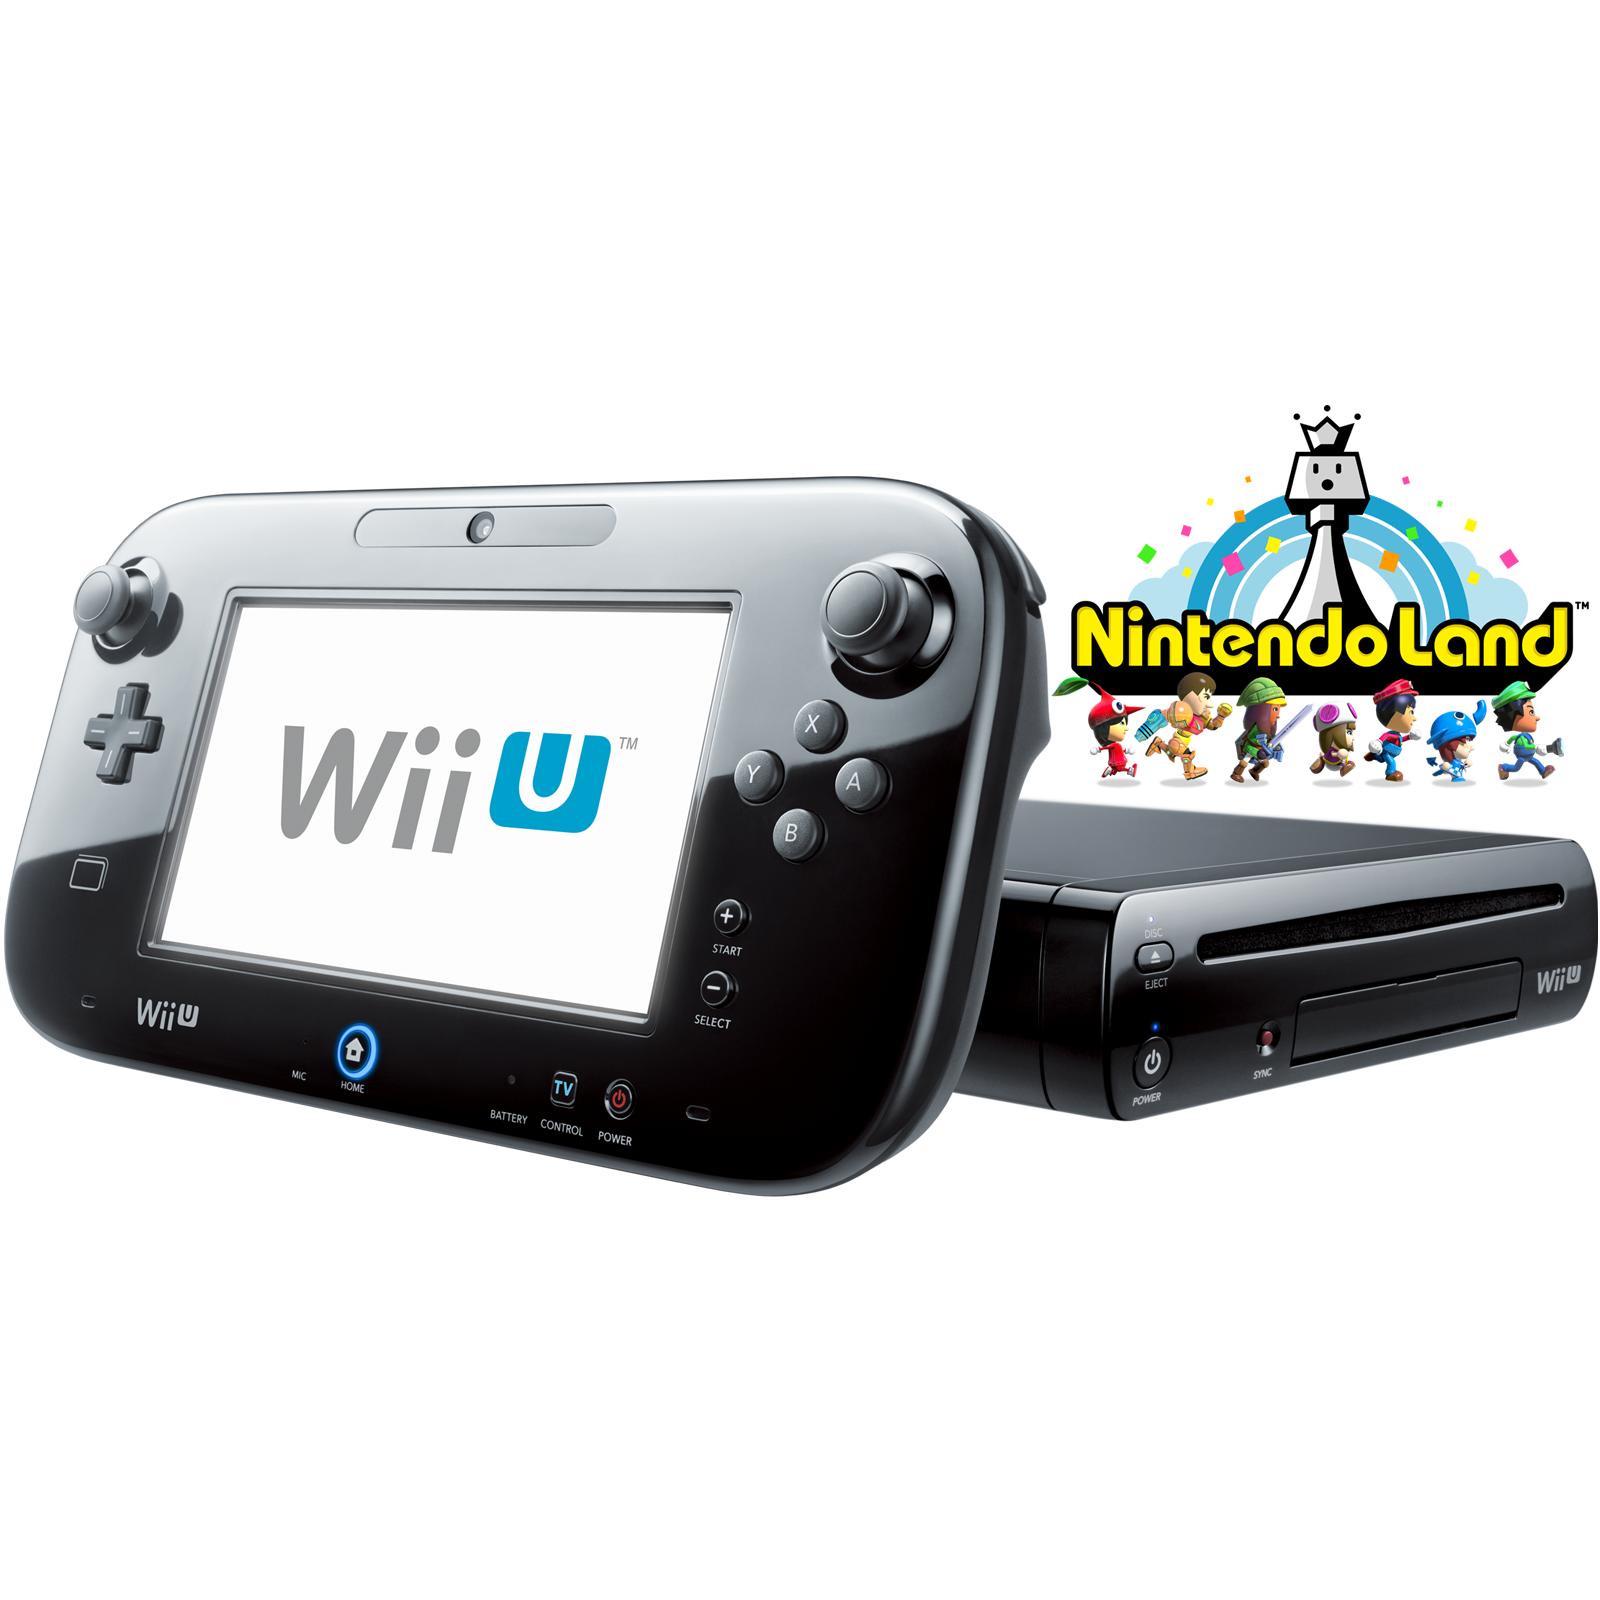 Game boy color quanto vale - Black Wii U 32gb Deluxe Nintendo Land Factory Refurbished By Nintendo